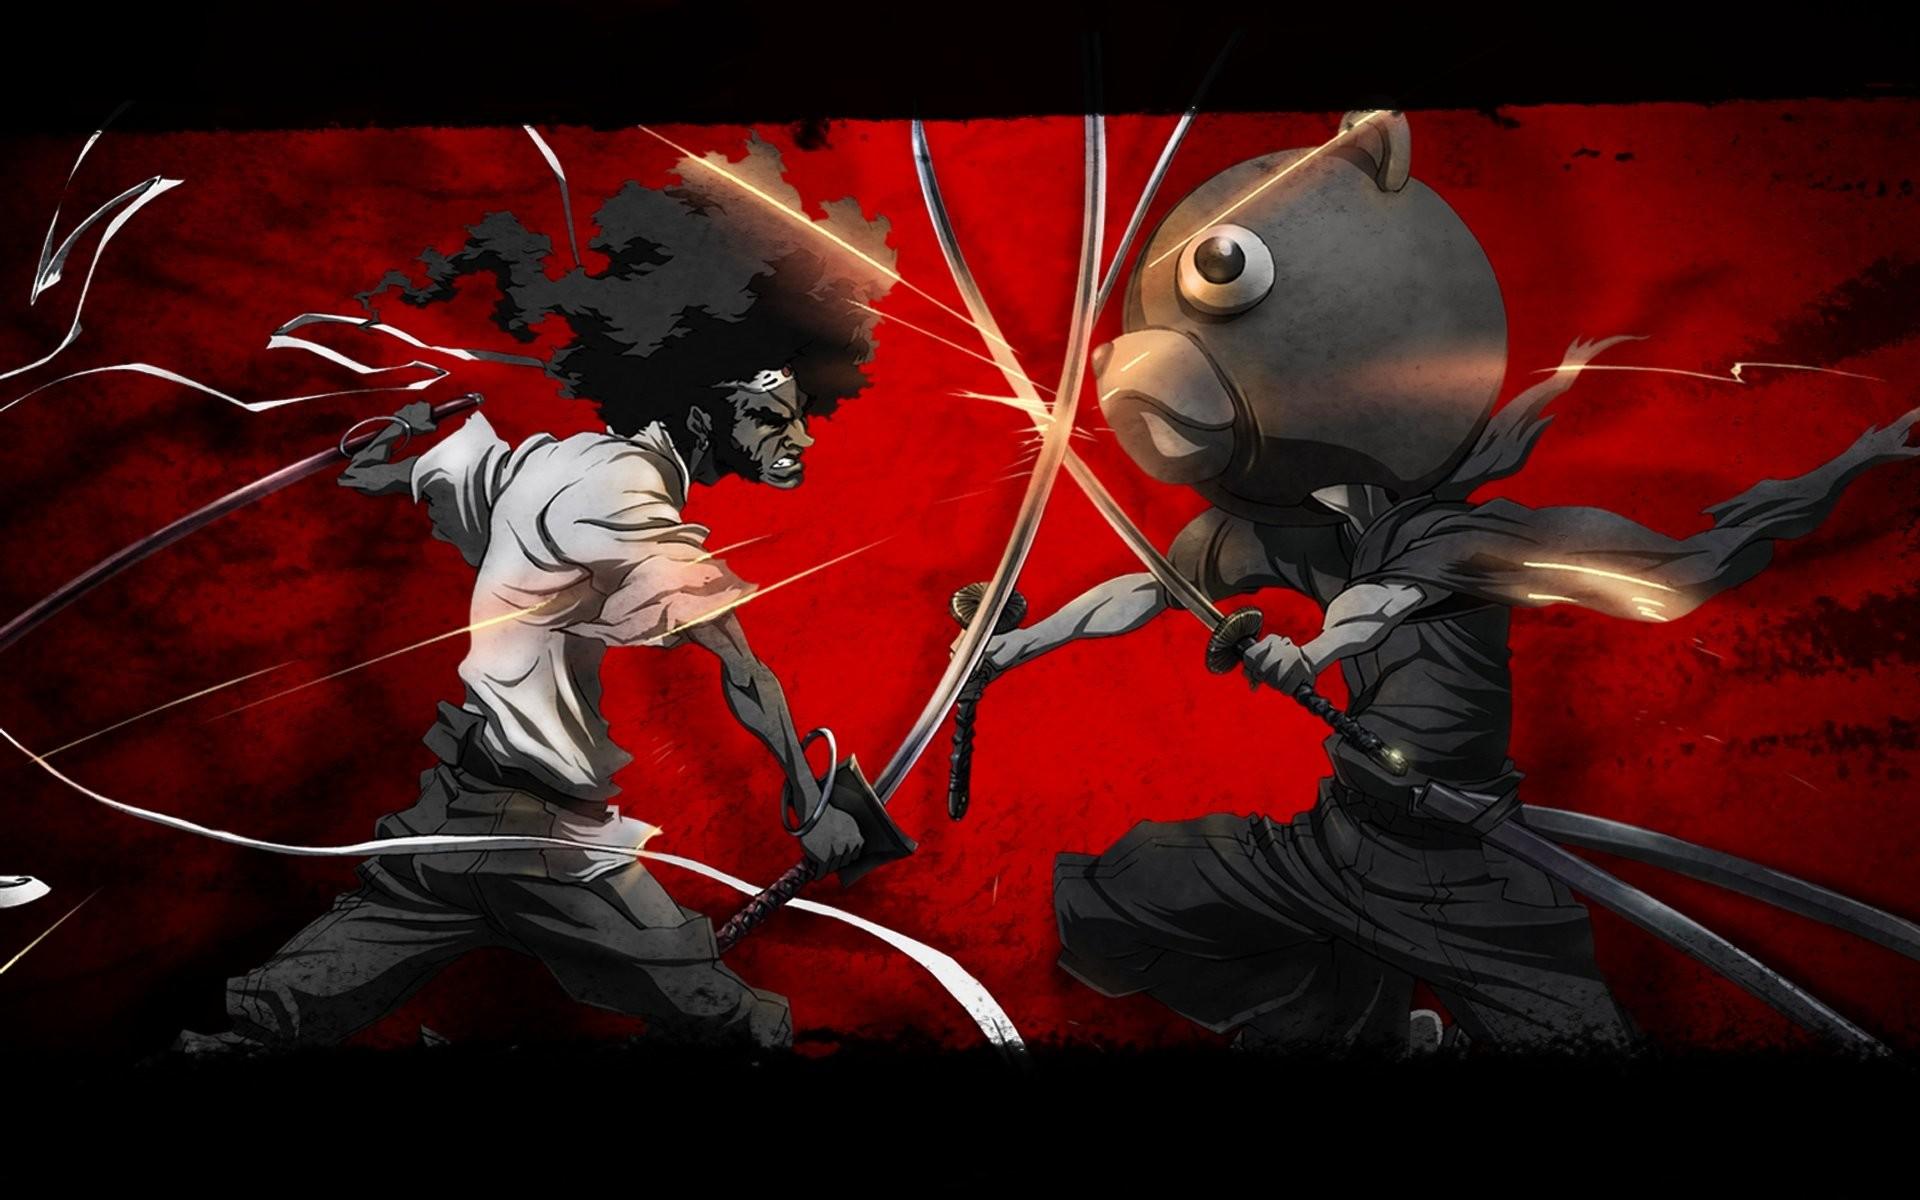 Afro Samurai Wallpaper HD